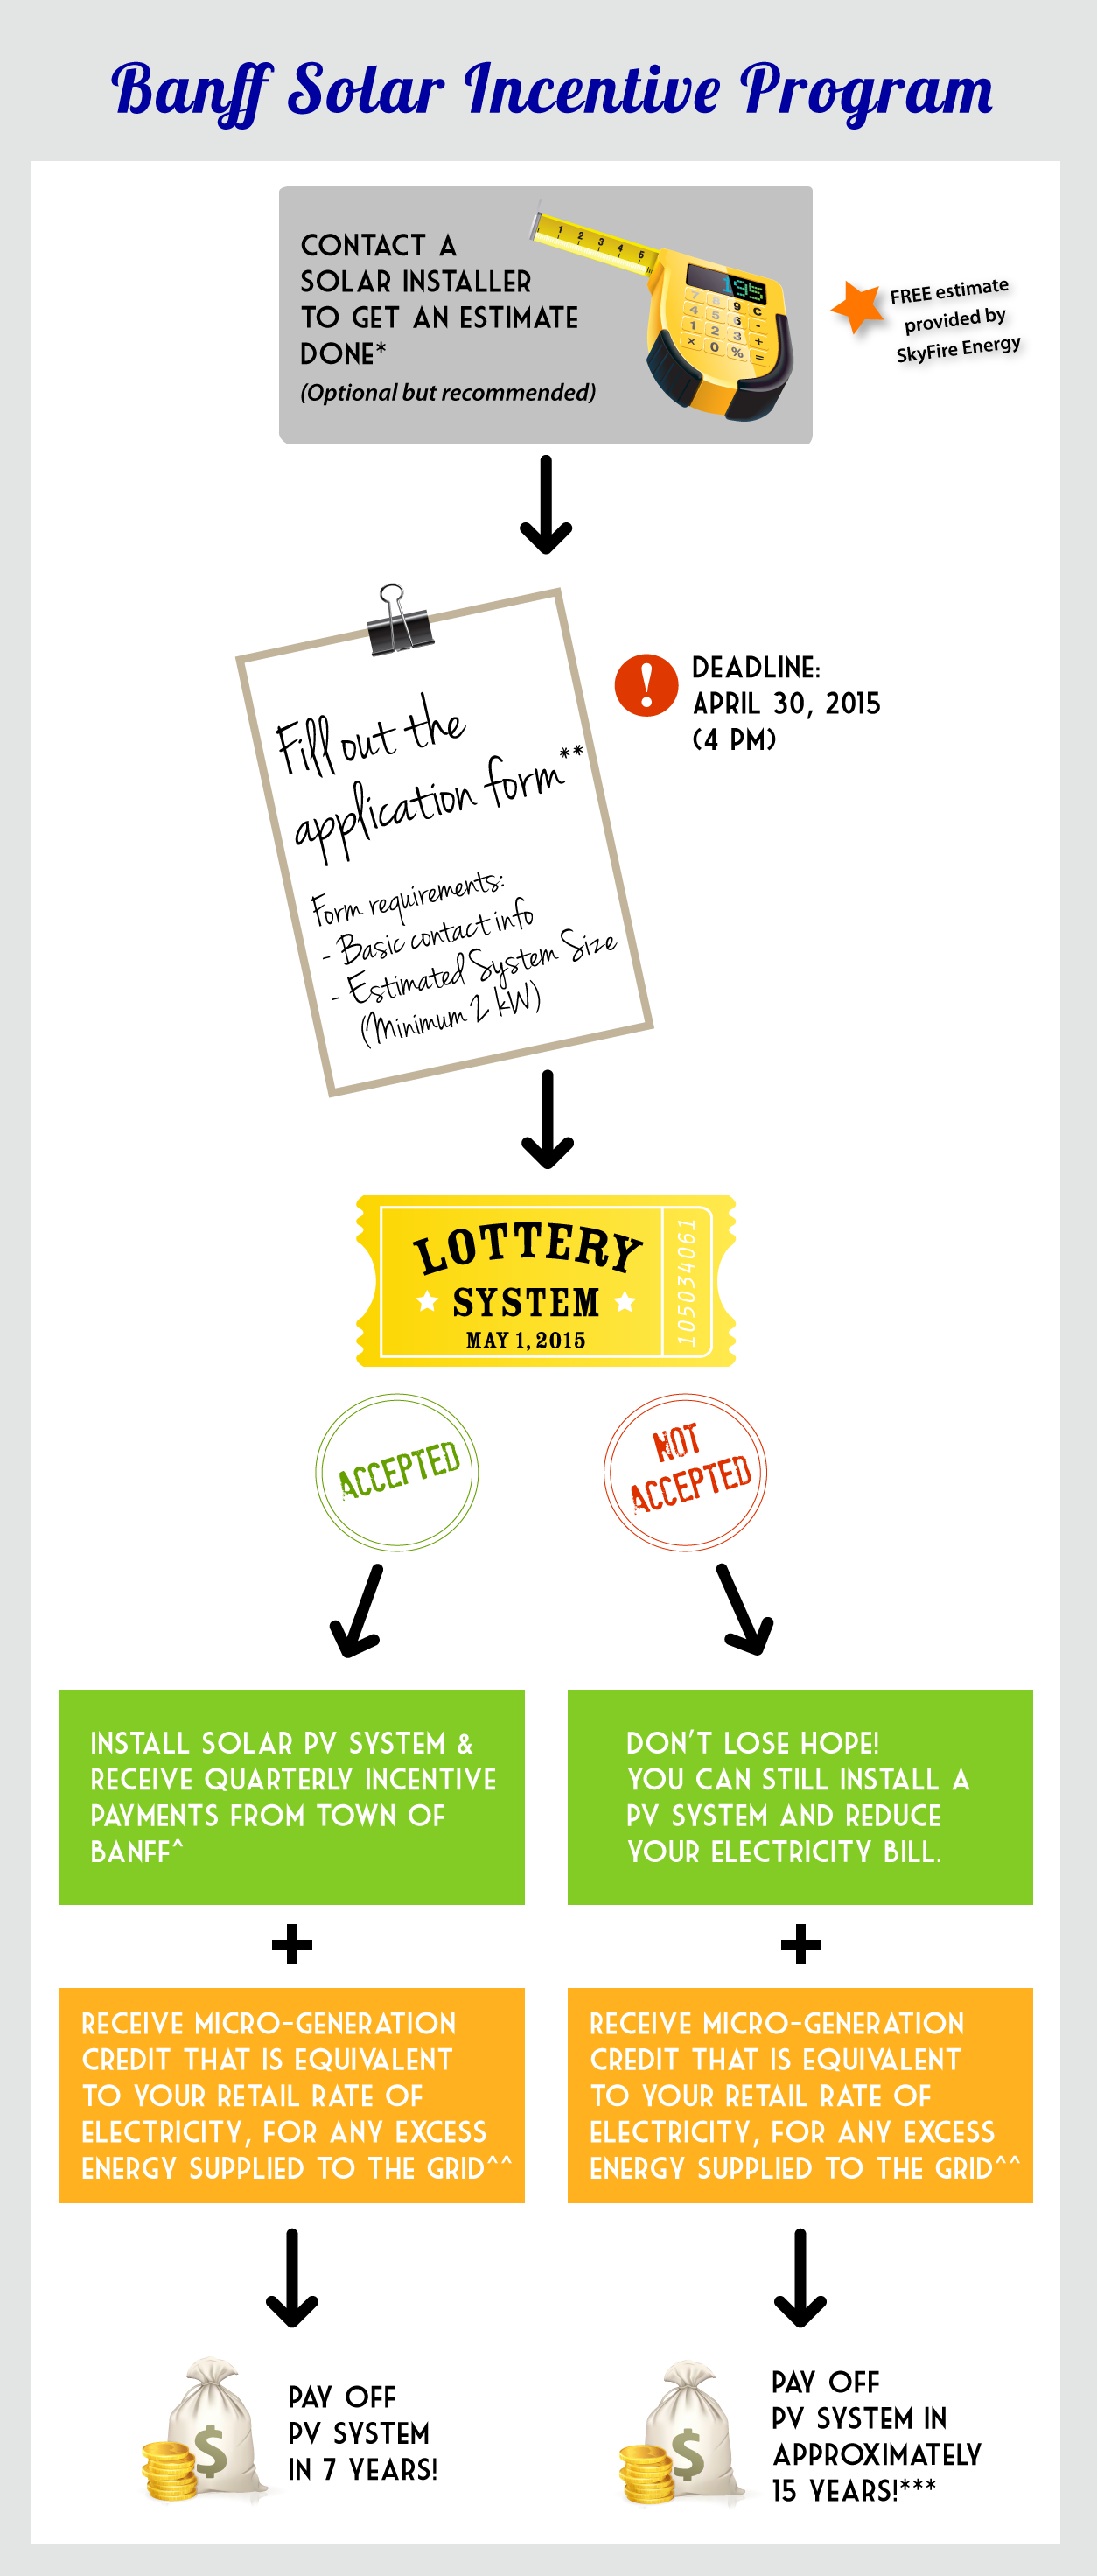 Banff-Solar-Incentive-Program